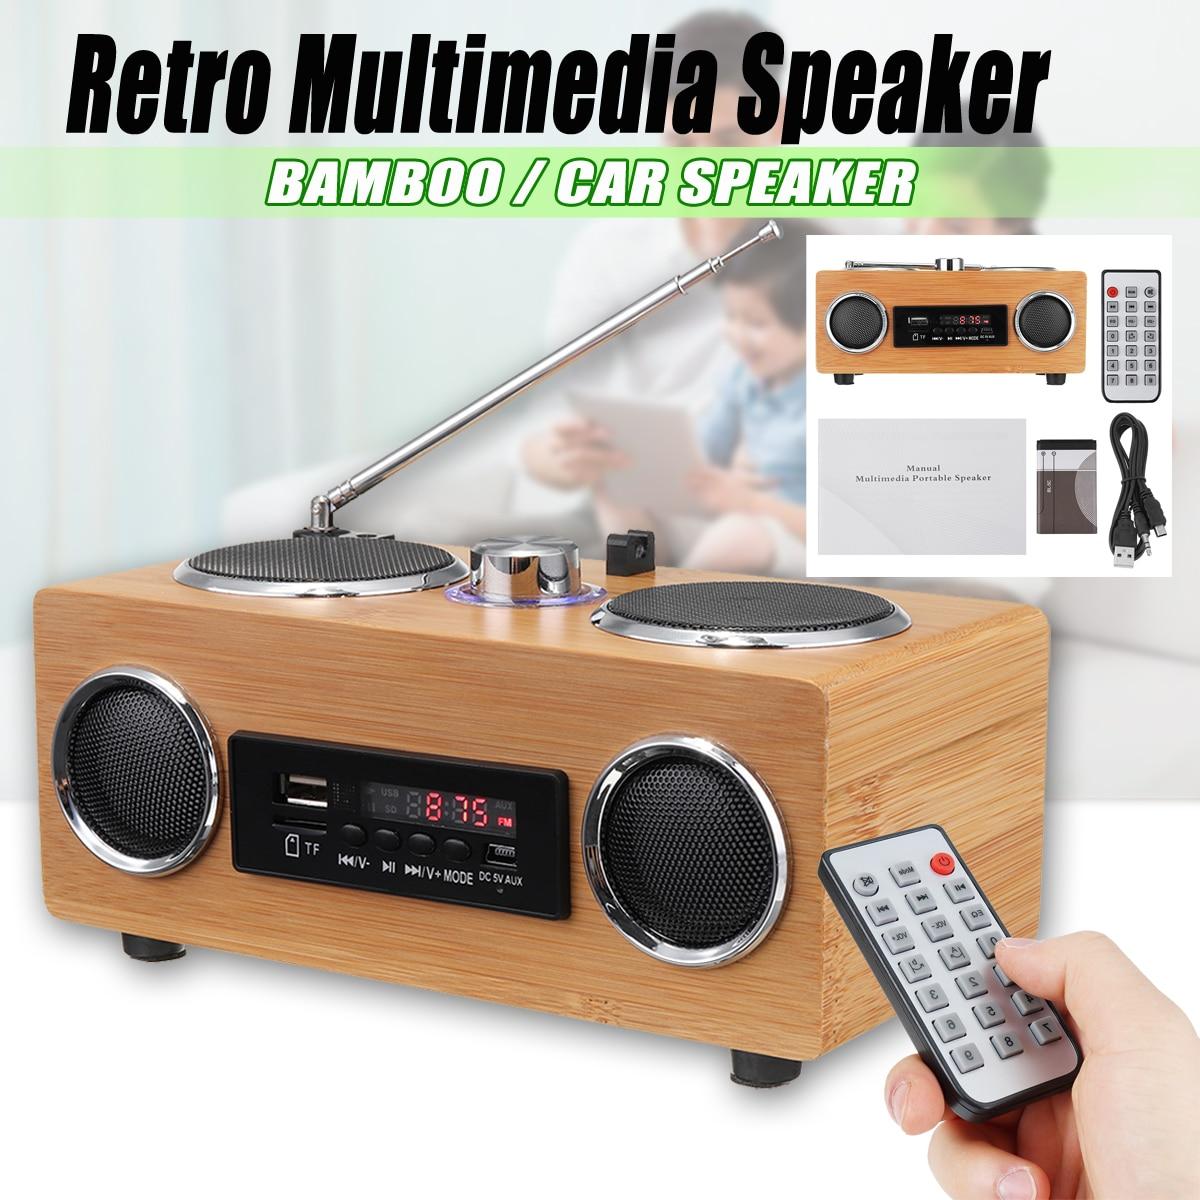 Retro Vintage Radio Super Bass FM Radio Bamboo Multimedia Speaker Classical Receiver USB With MP3 Player Remote Control